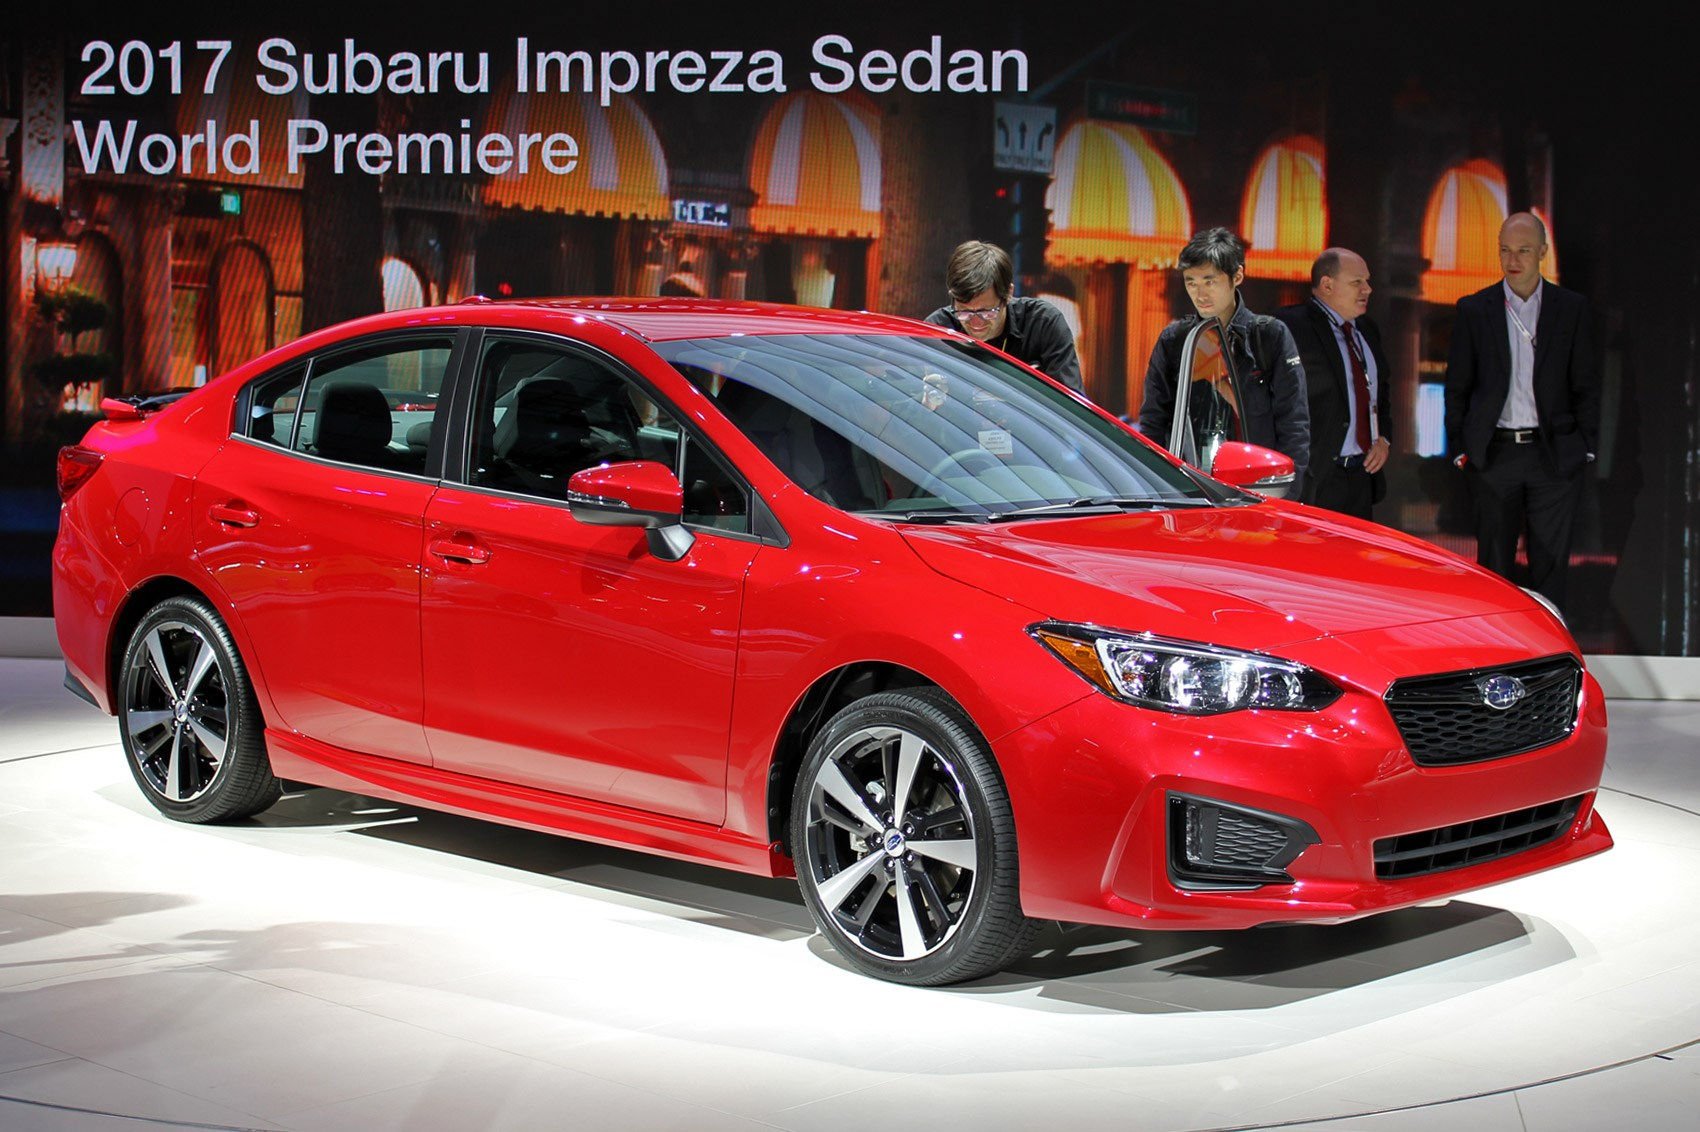 New Subaru Impreza will appear on the market in 2017 10